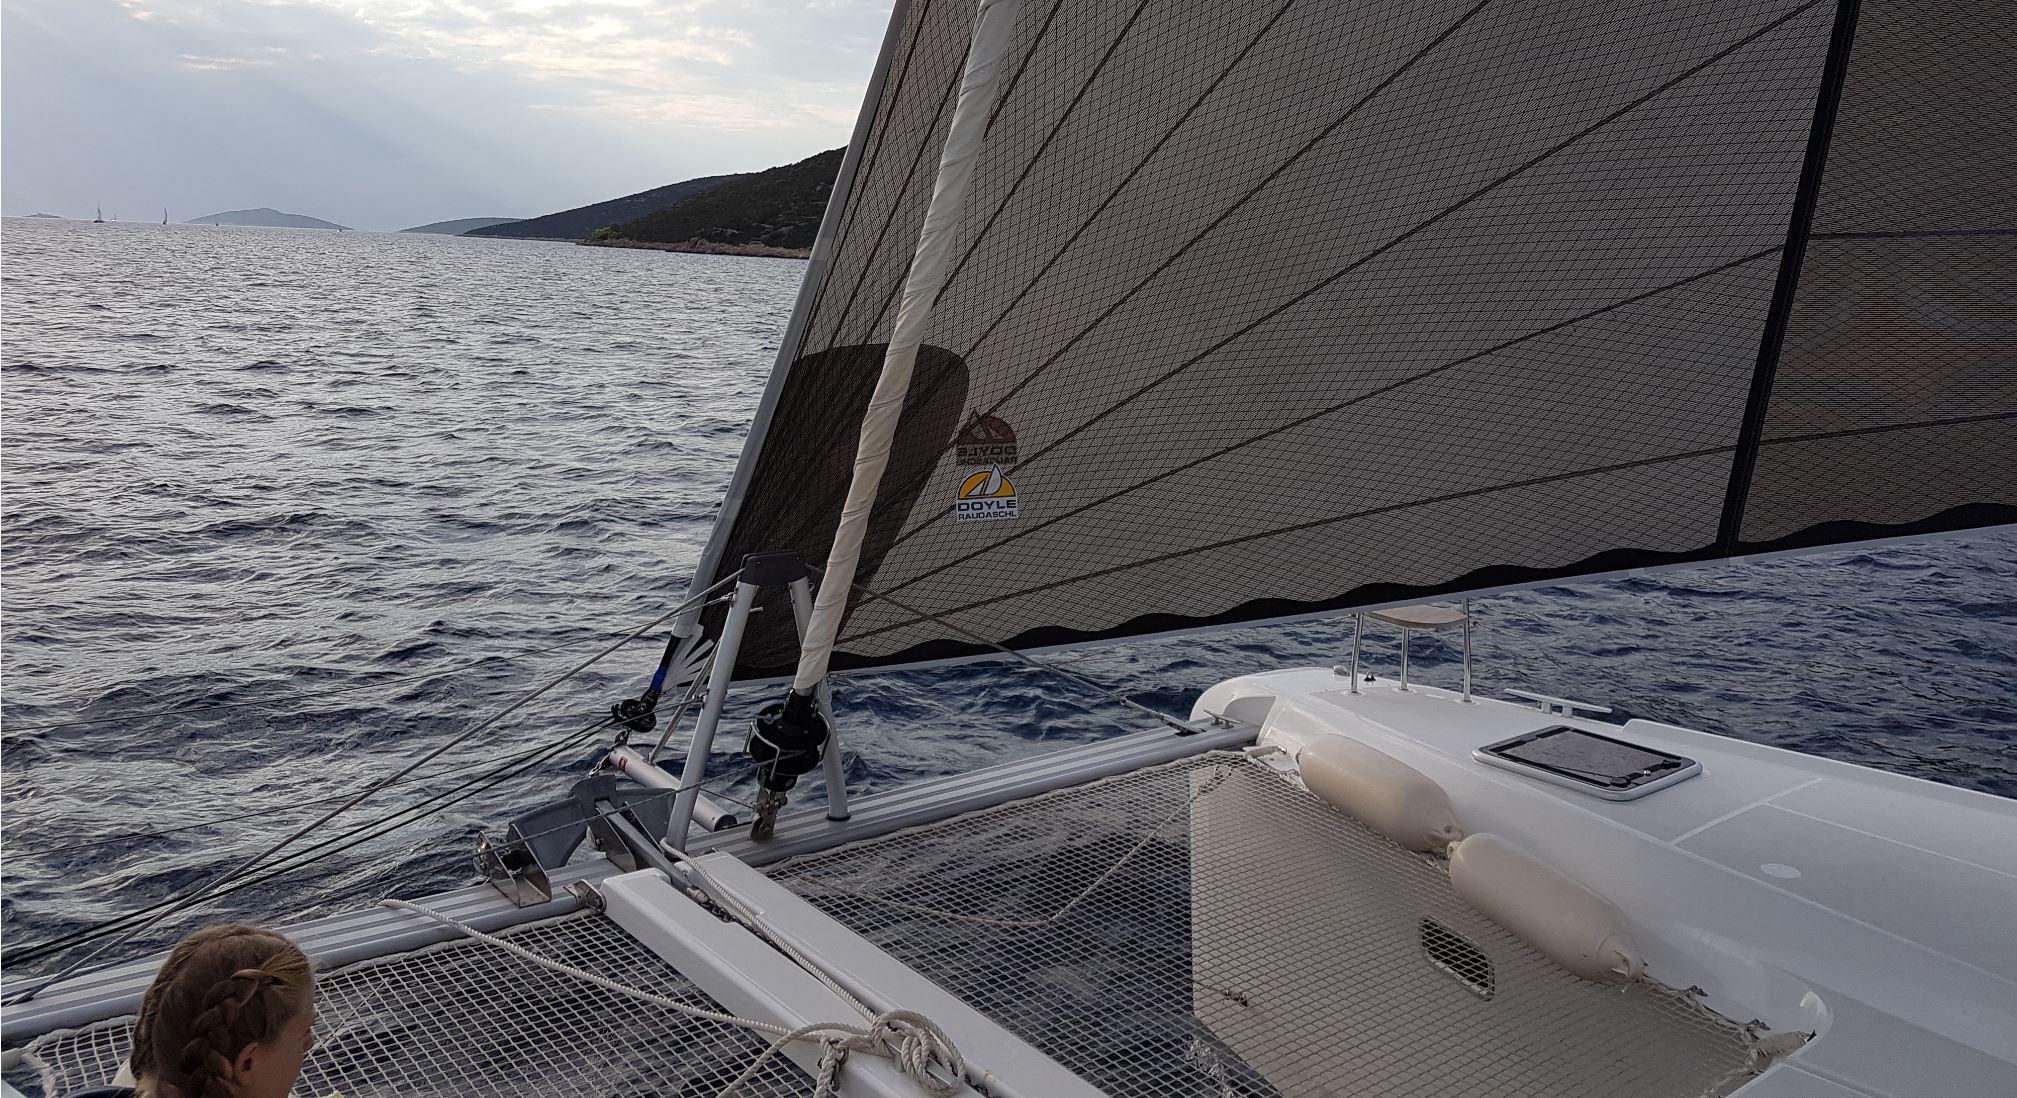 Super Entspantes Segeln mit Skipper Ehepaar